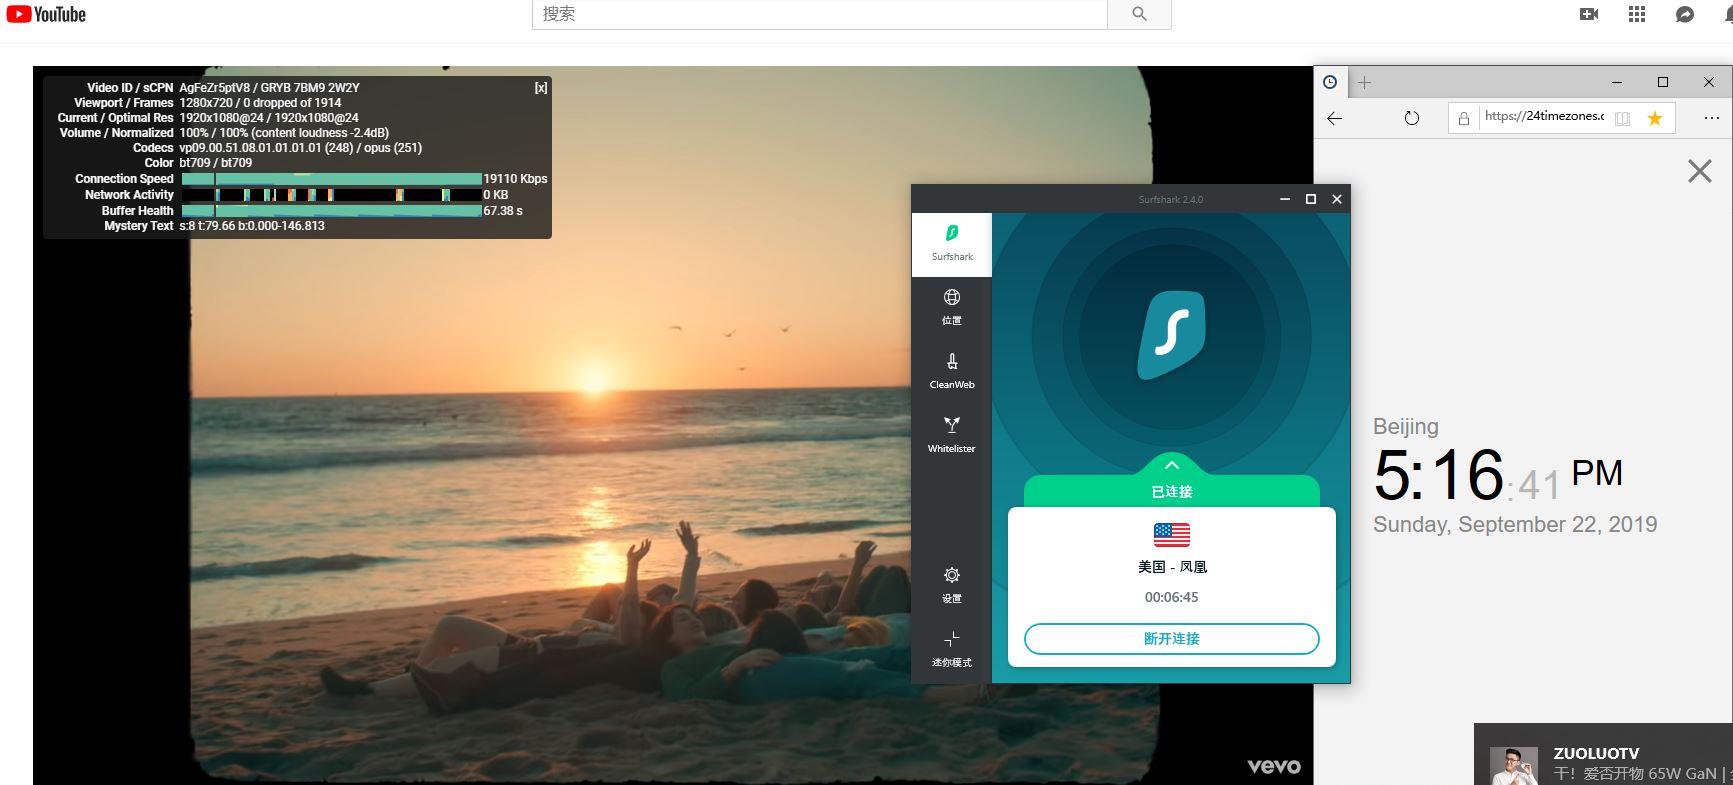 Windows SurfsharkVPN 美国-凤凰 服务器 中国VPN翻墙 科学上网 YouTube测速-20190922